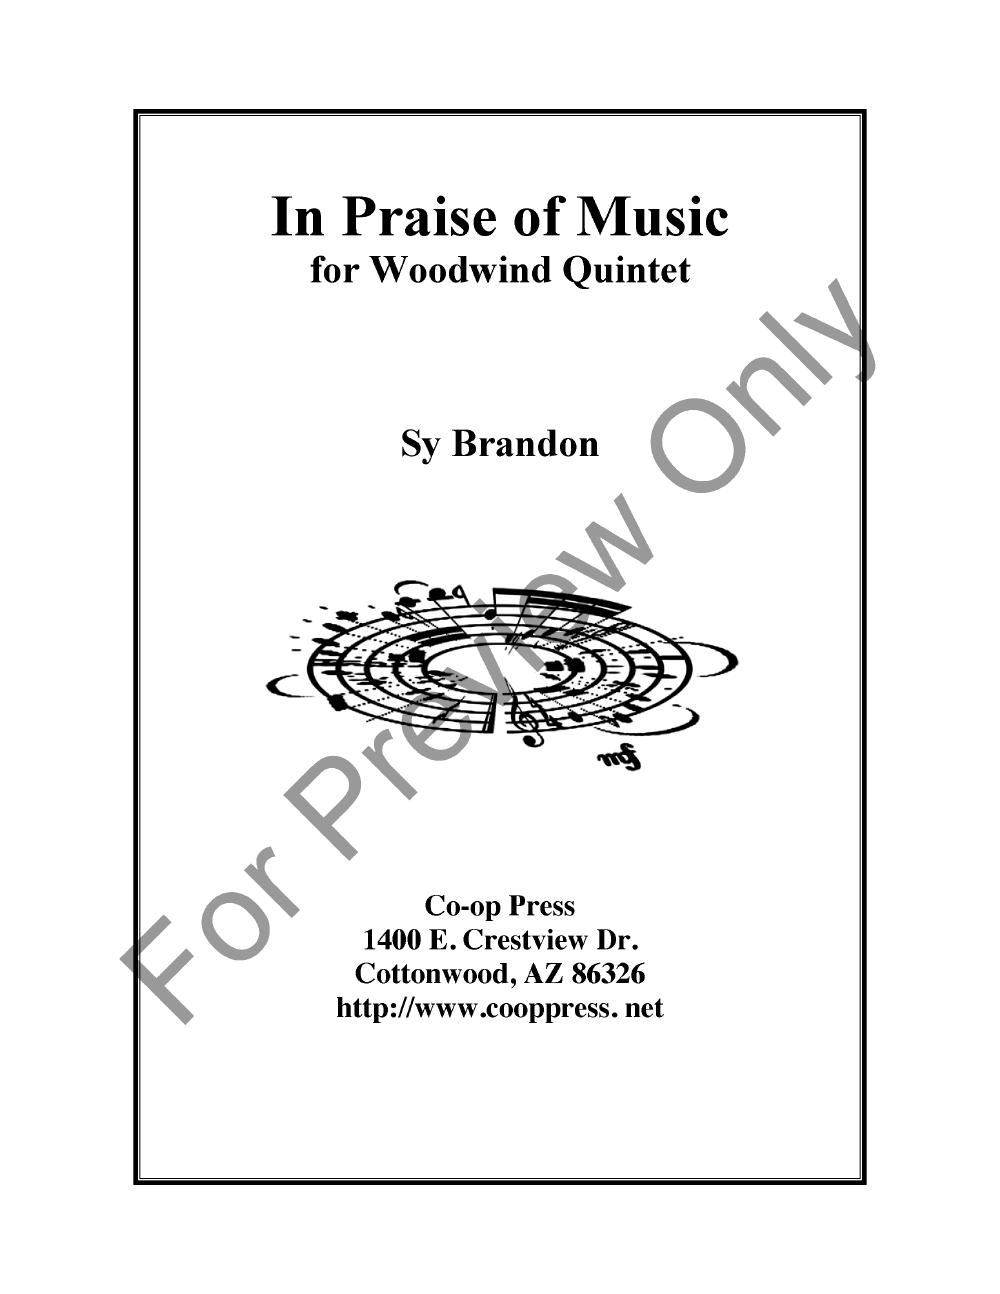 In Praise of Music Thumbnail